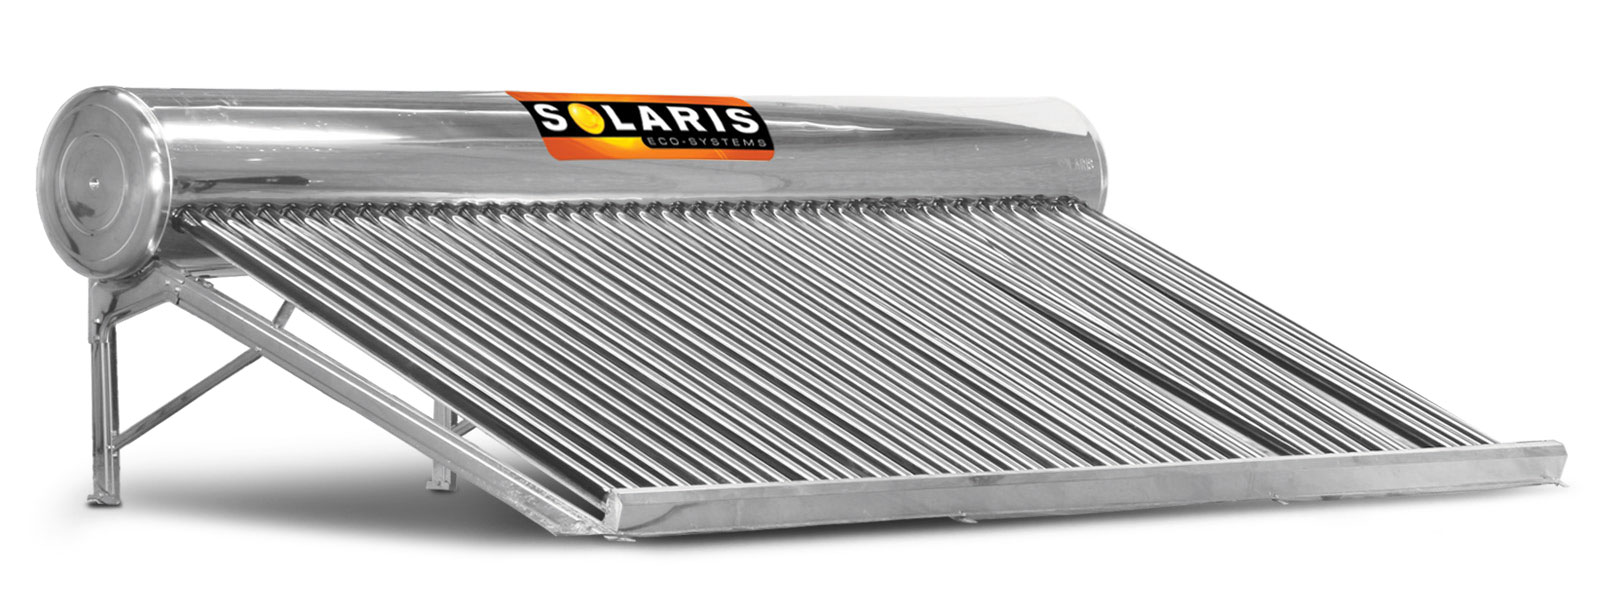 Calentador Solar Solaris